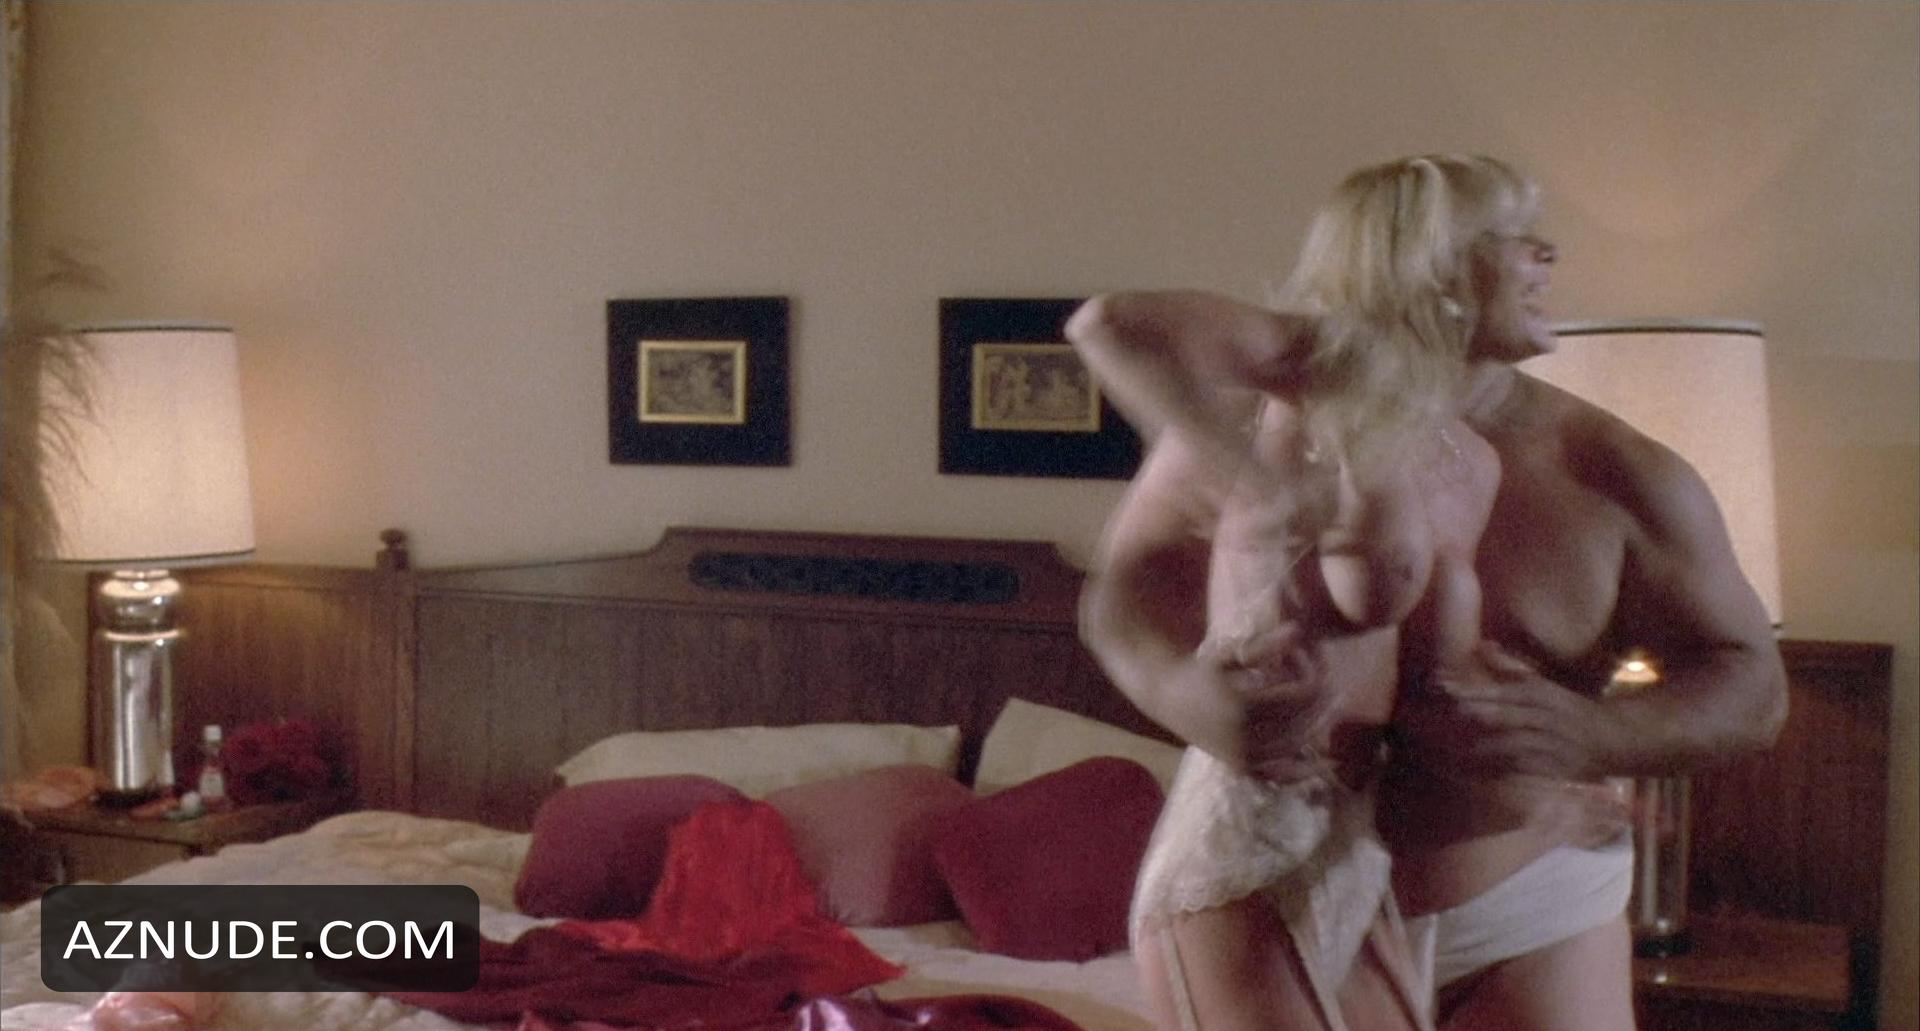 A spanish porn video